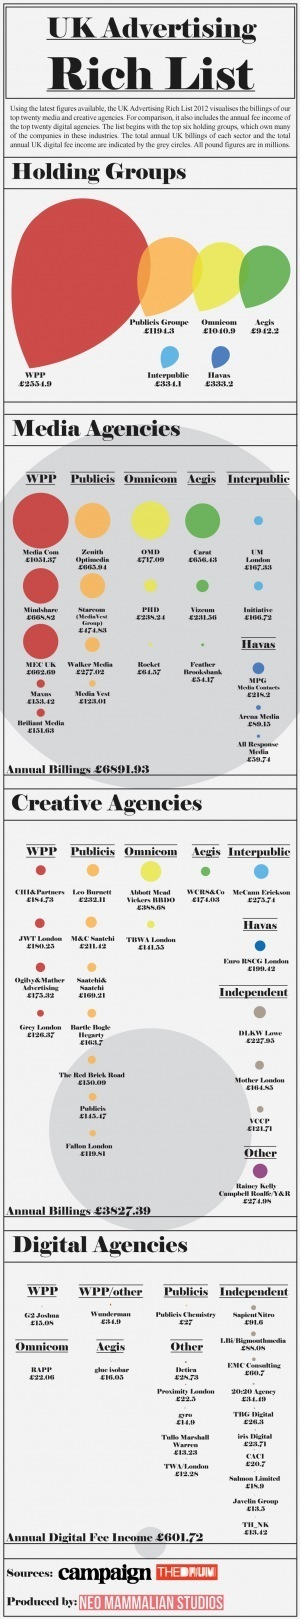 UK Advertising Rich List[INFOGRAPHIC]   Klaptrap On Infographics   Scoop.it